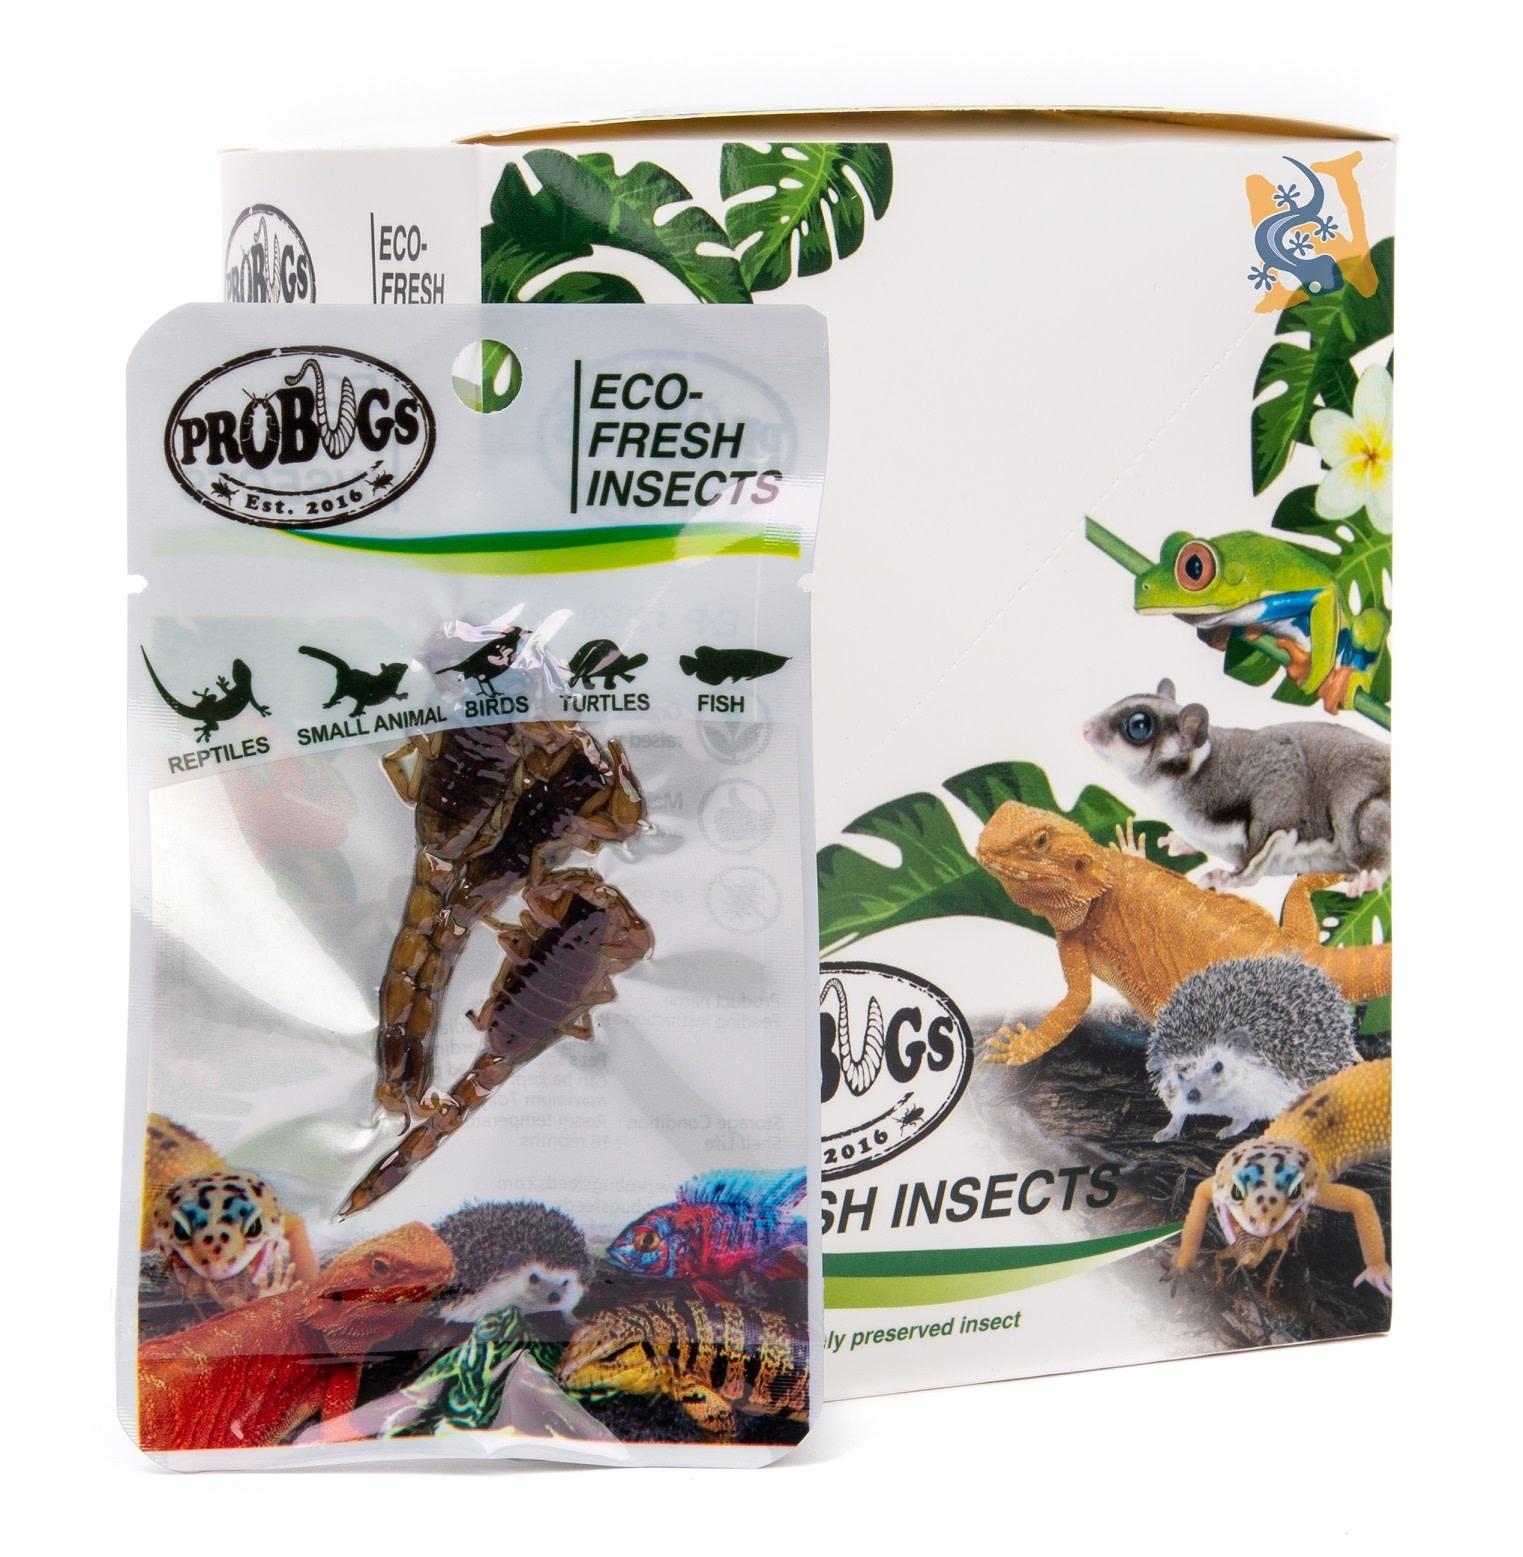 ProBugs Scorpion Eco-Fresh/Scorpion